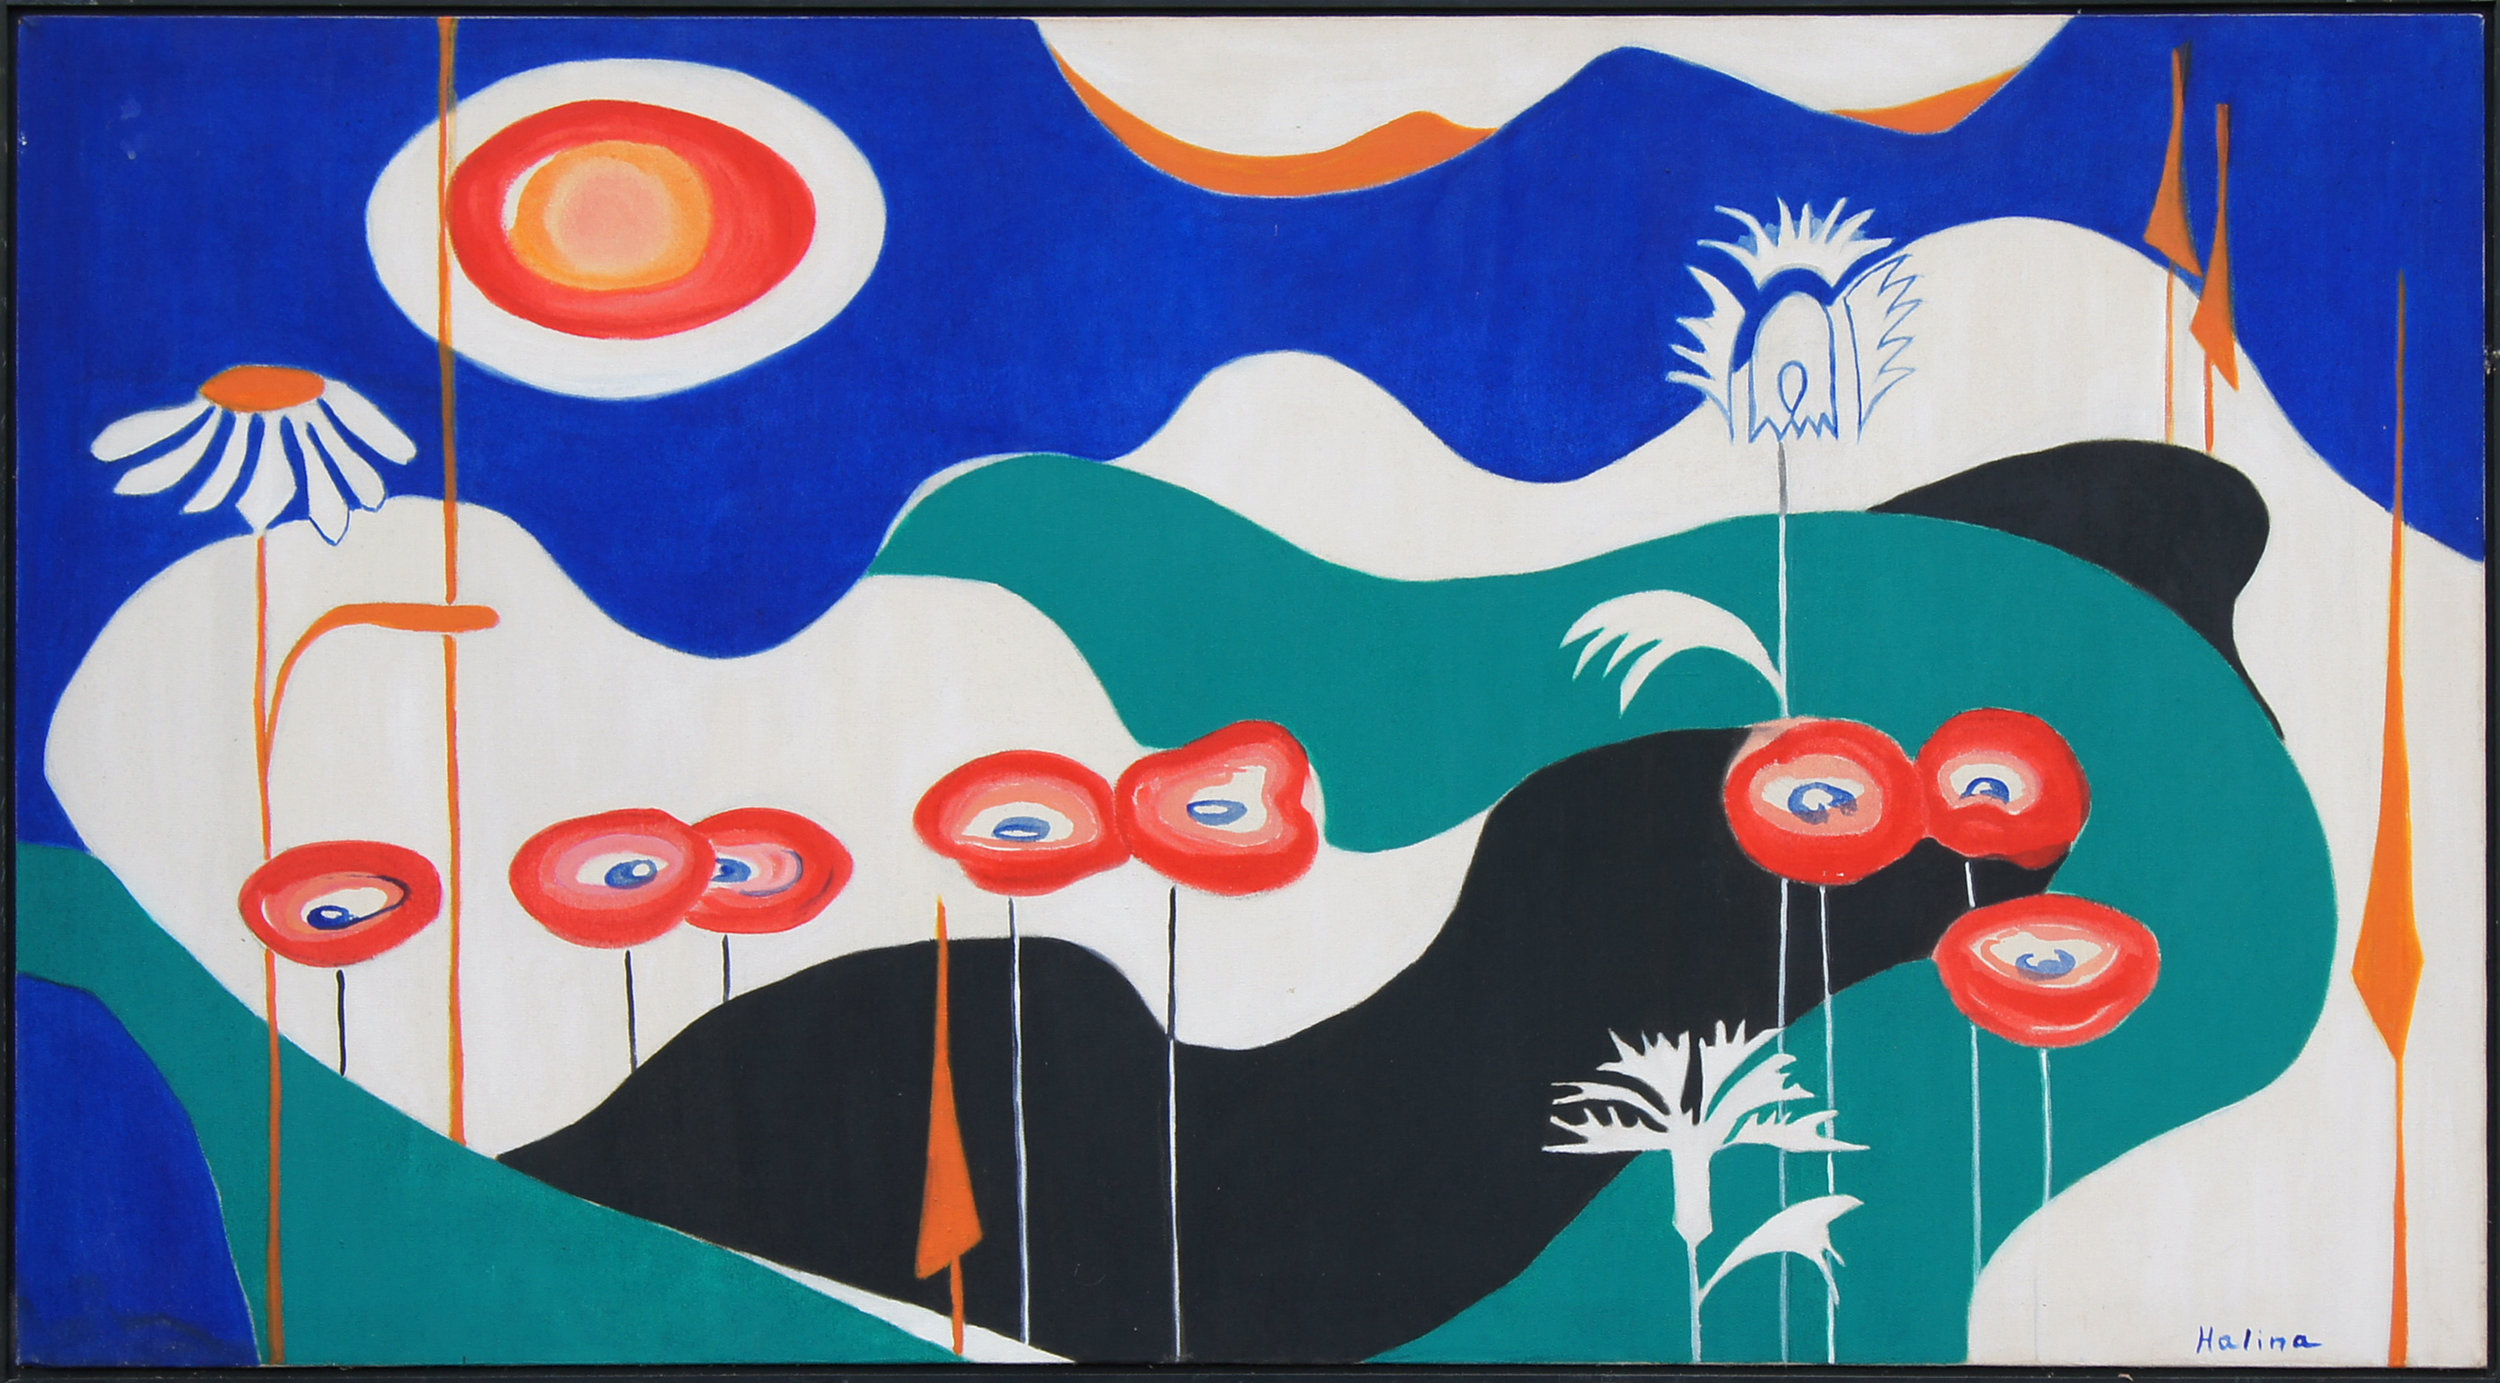 "Helena Rusak (1928-2000), ""Scarlet Sentinels,"" 1973 - Acrylic on canvas, collection of Natasha Rusak and Ludmilla Rusak Grant"